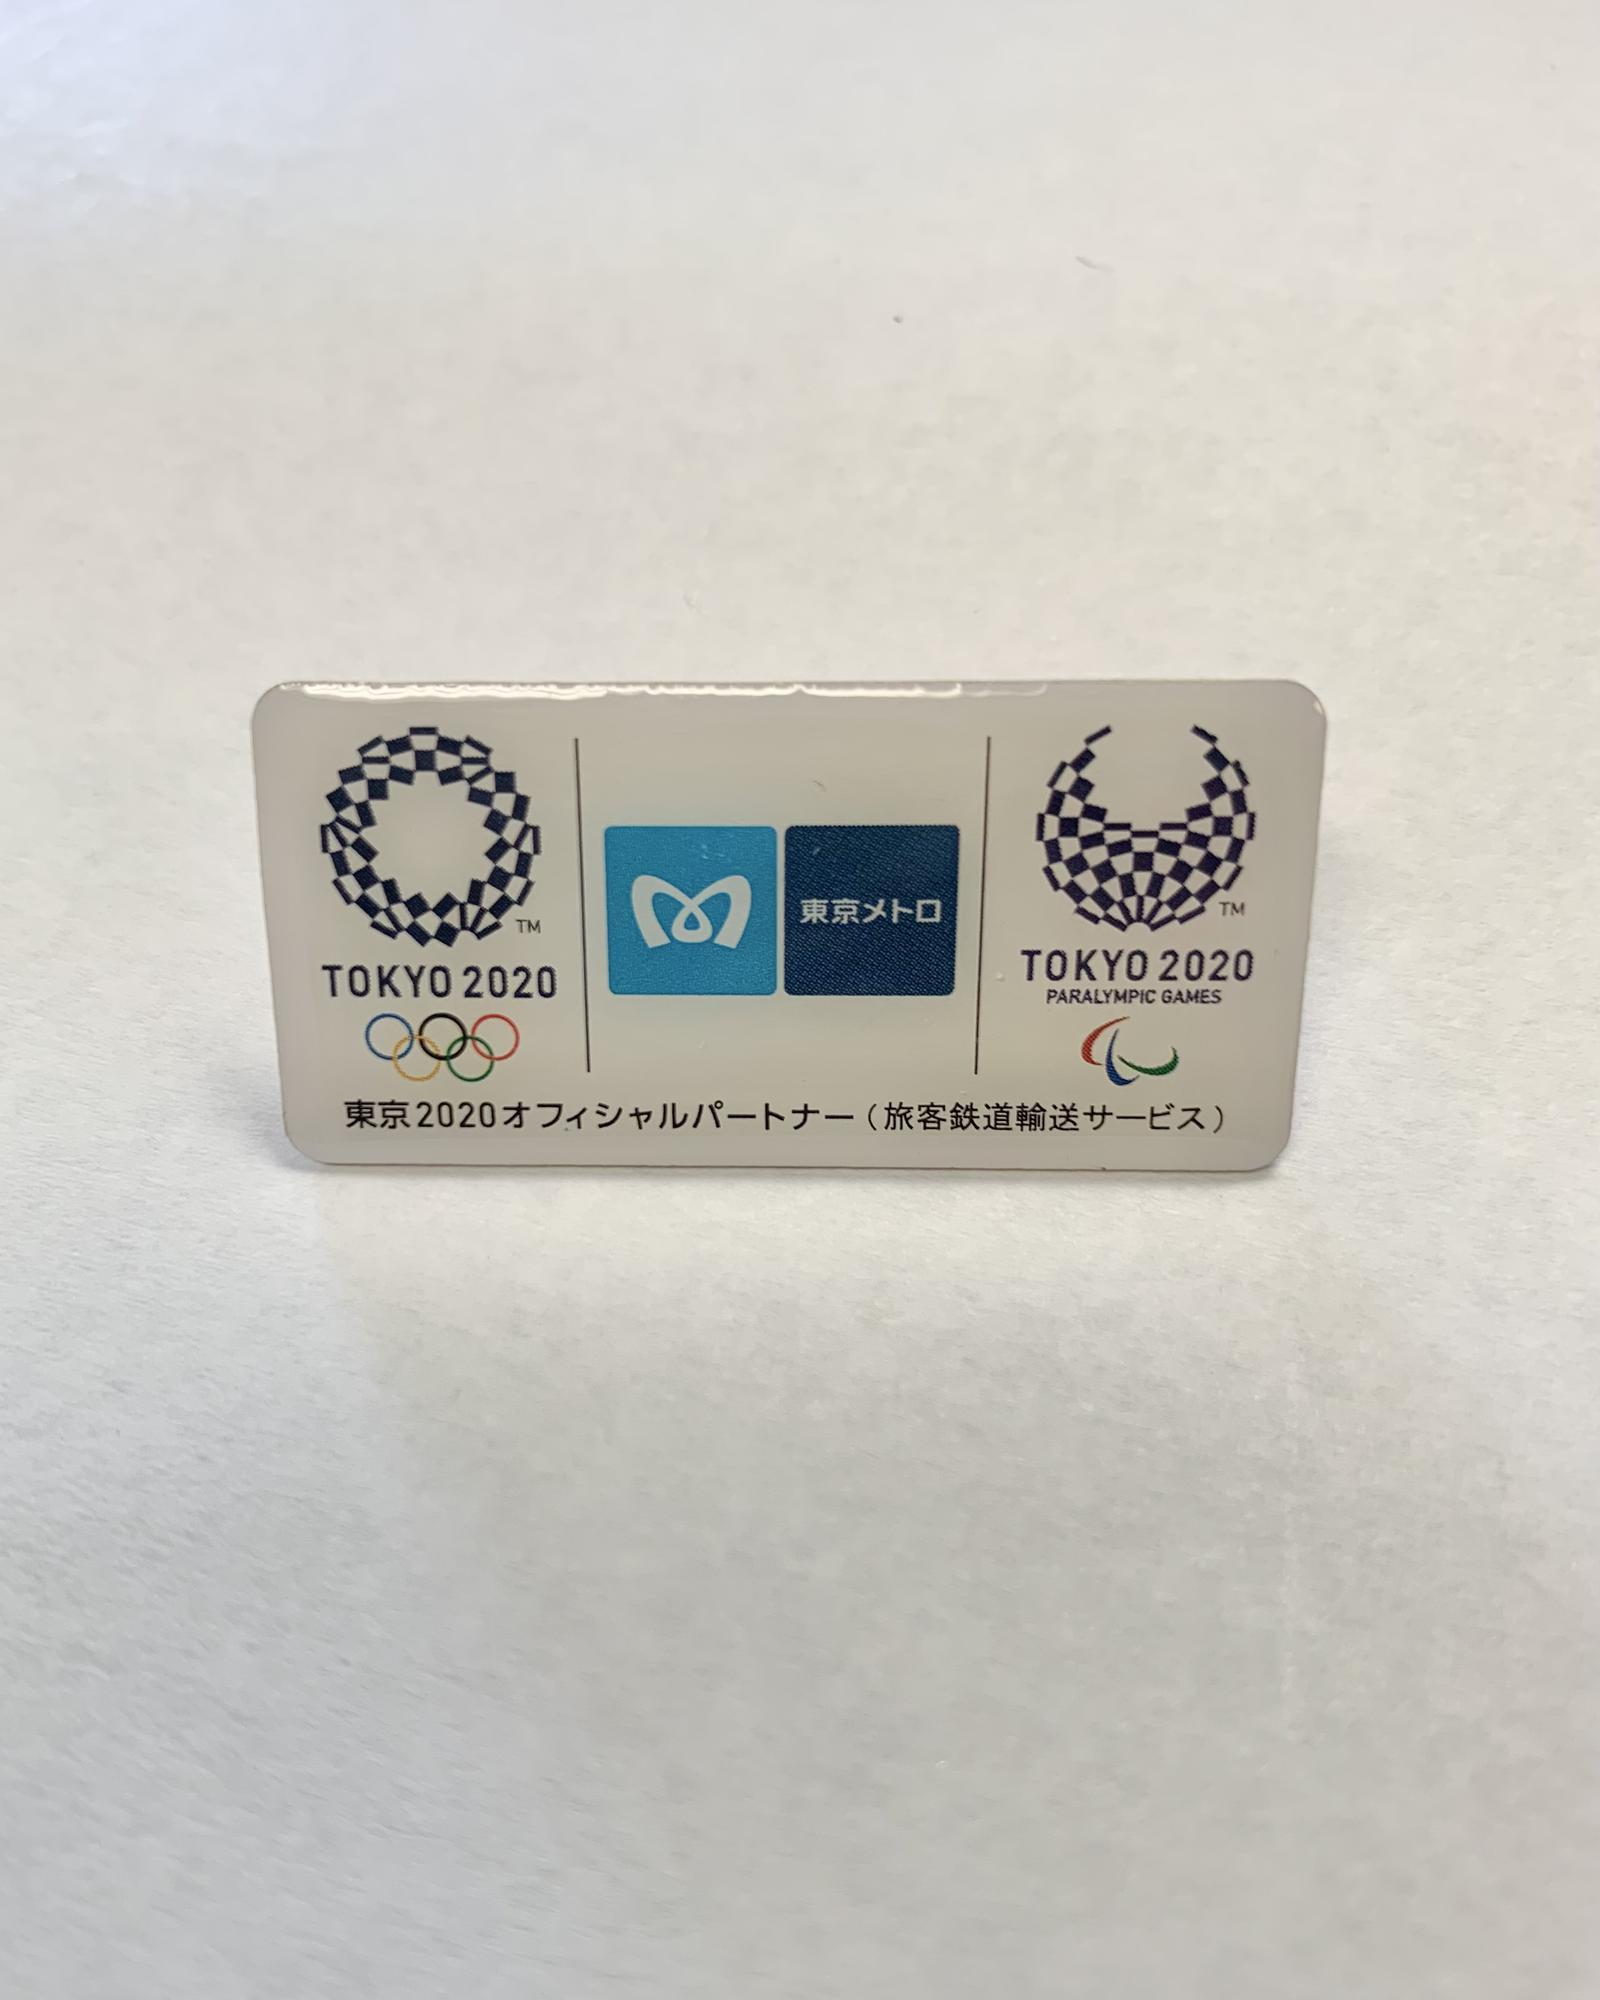 Tokyo Metro w/ Tokyo 2020 Olympic/Paralympic Logo